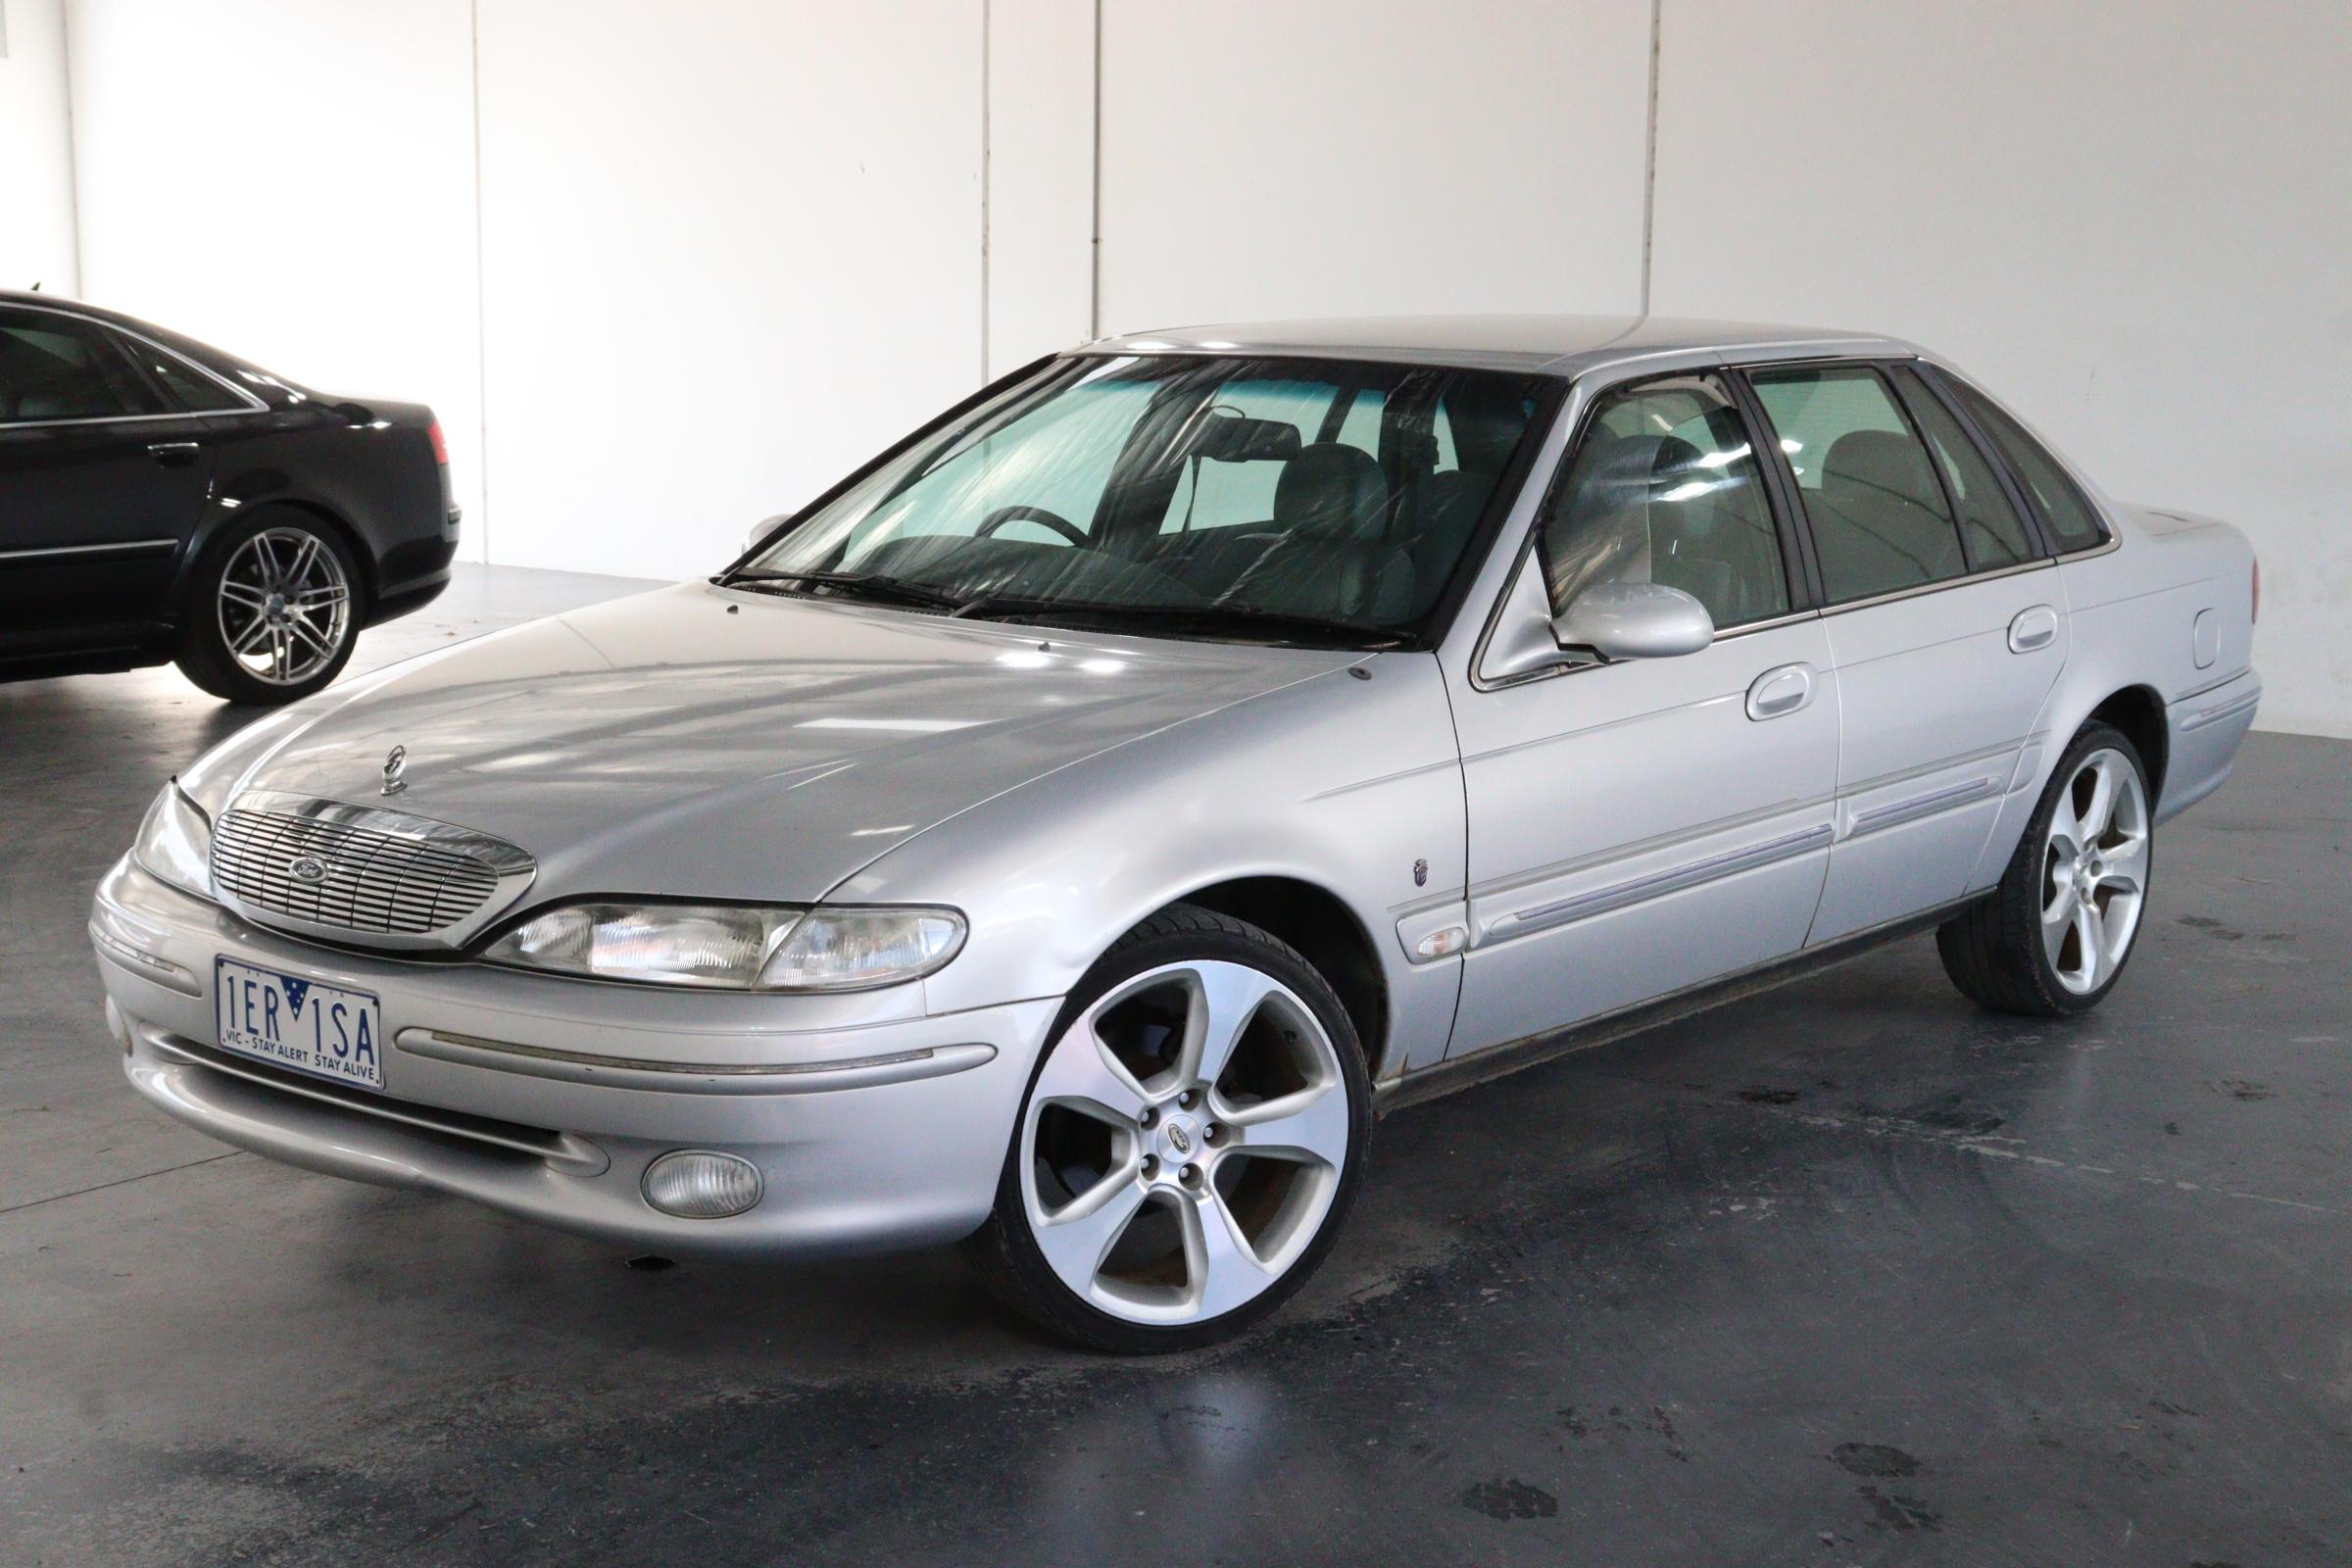 1997 Ford Fairlane Ghia NL Automatic Sedan